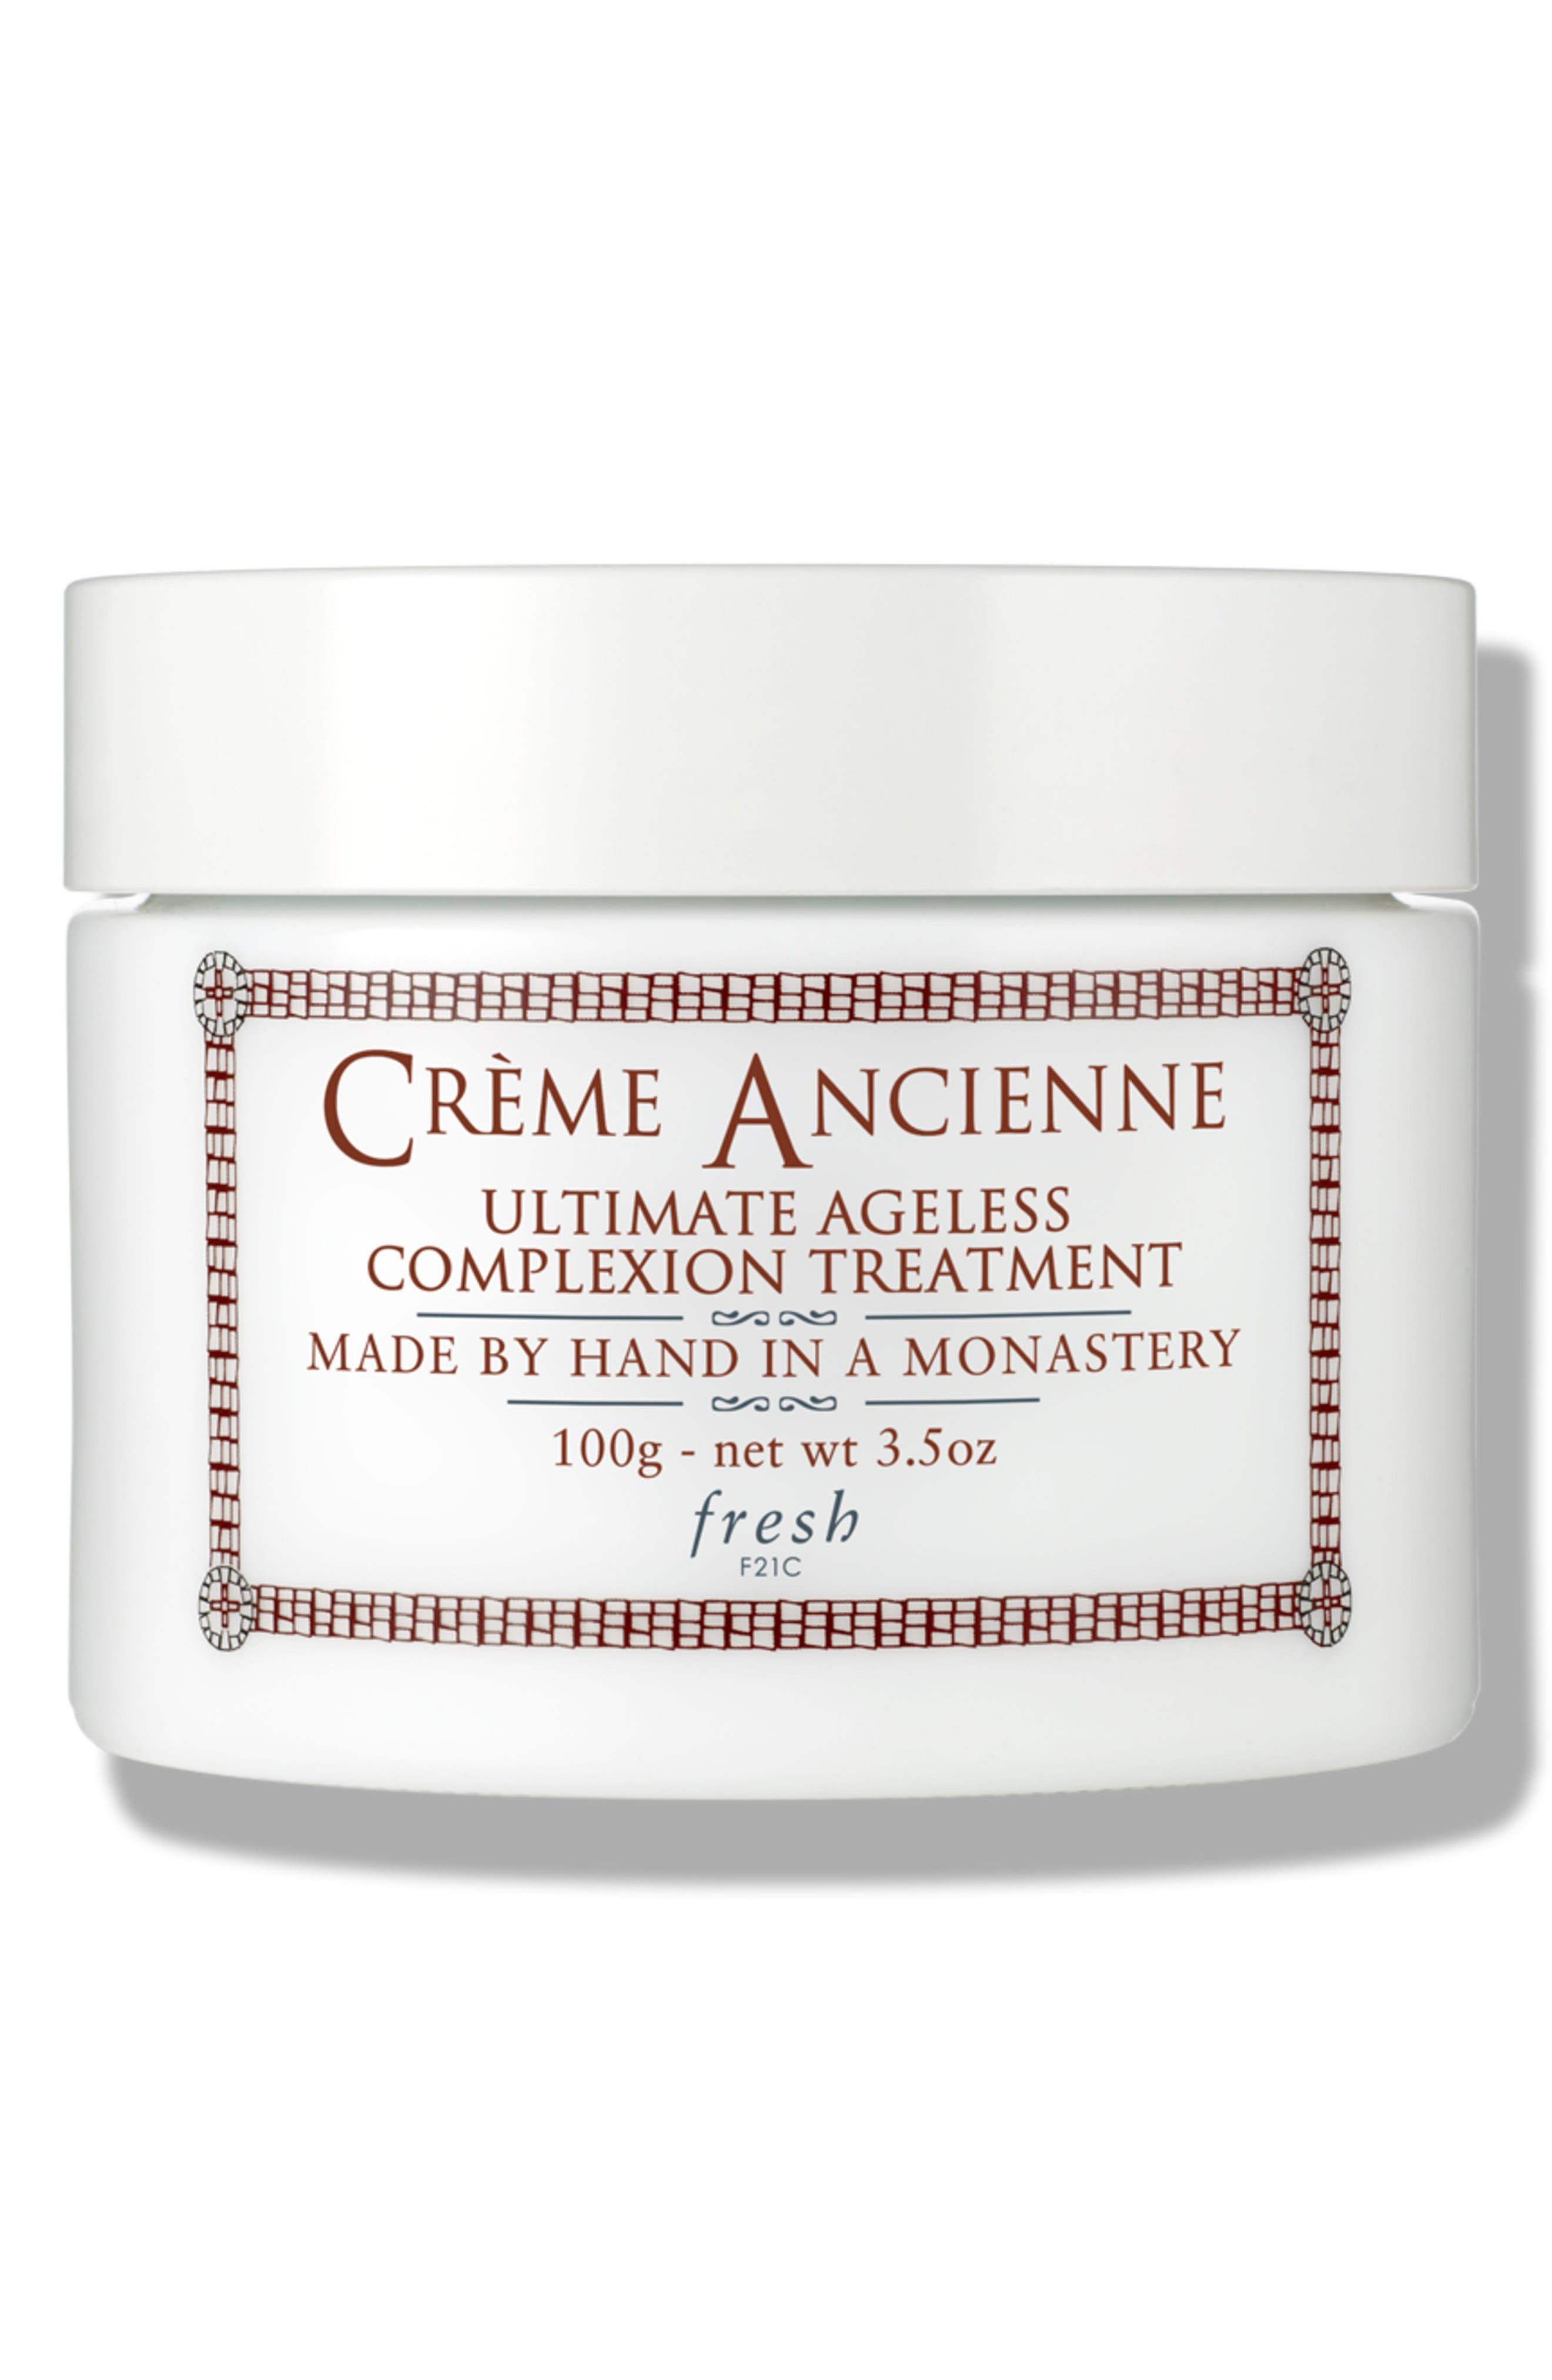 Crème Ancienne Ultimate Ageless Complexion Treatment Moisturizer | Nordstrom